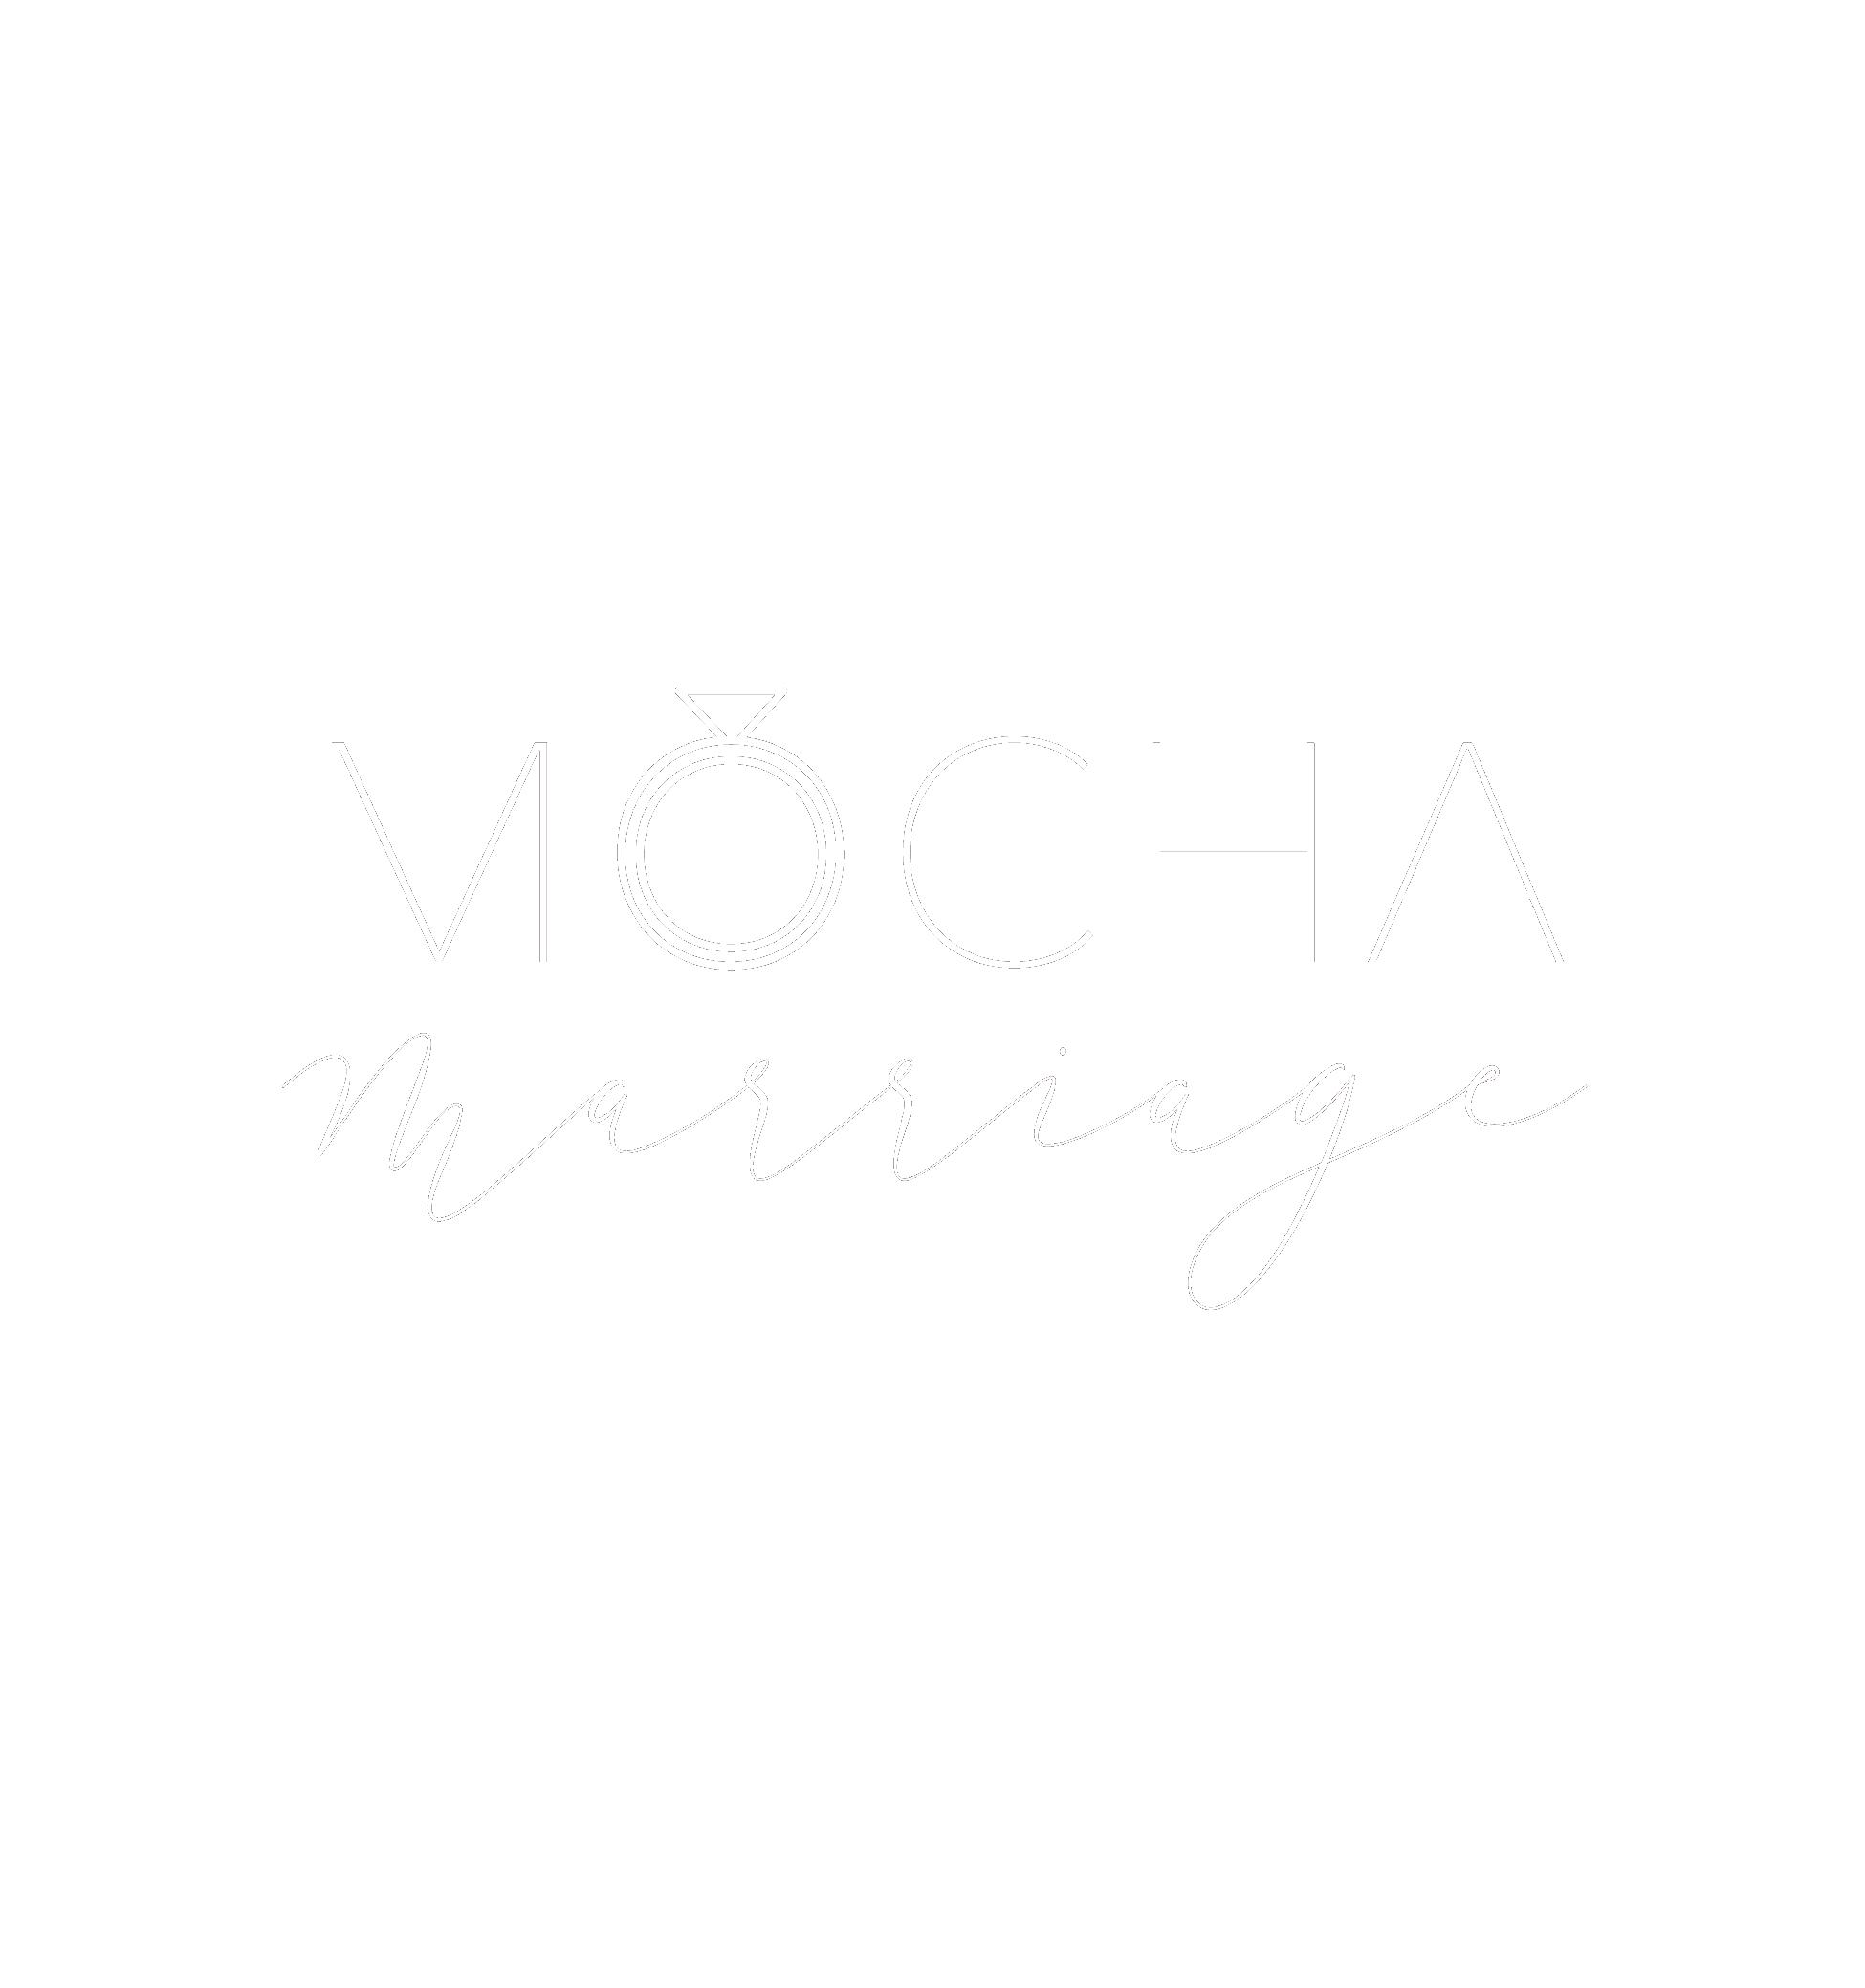 MM-Logo-white-on-transparent